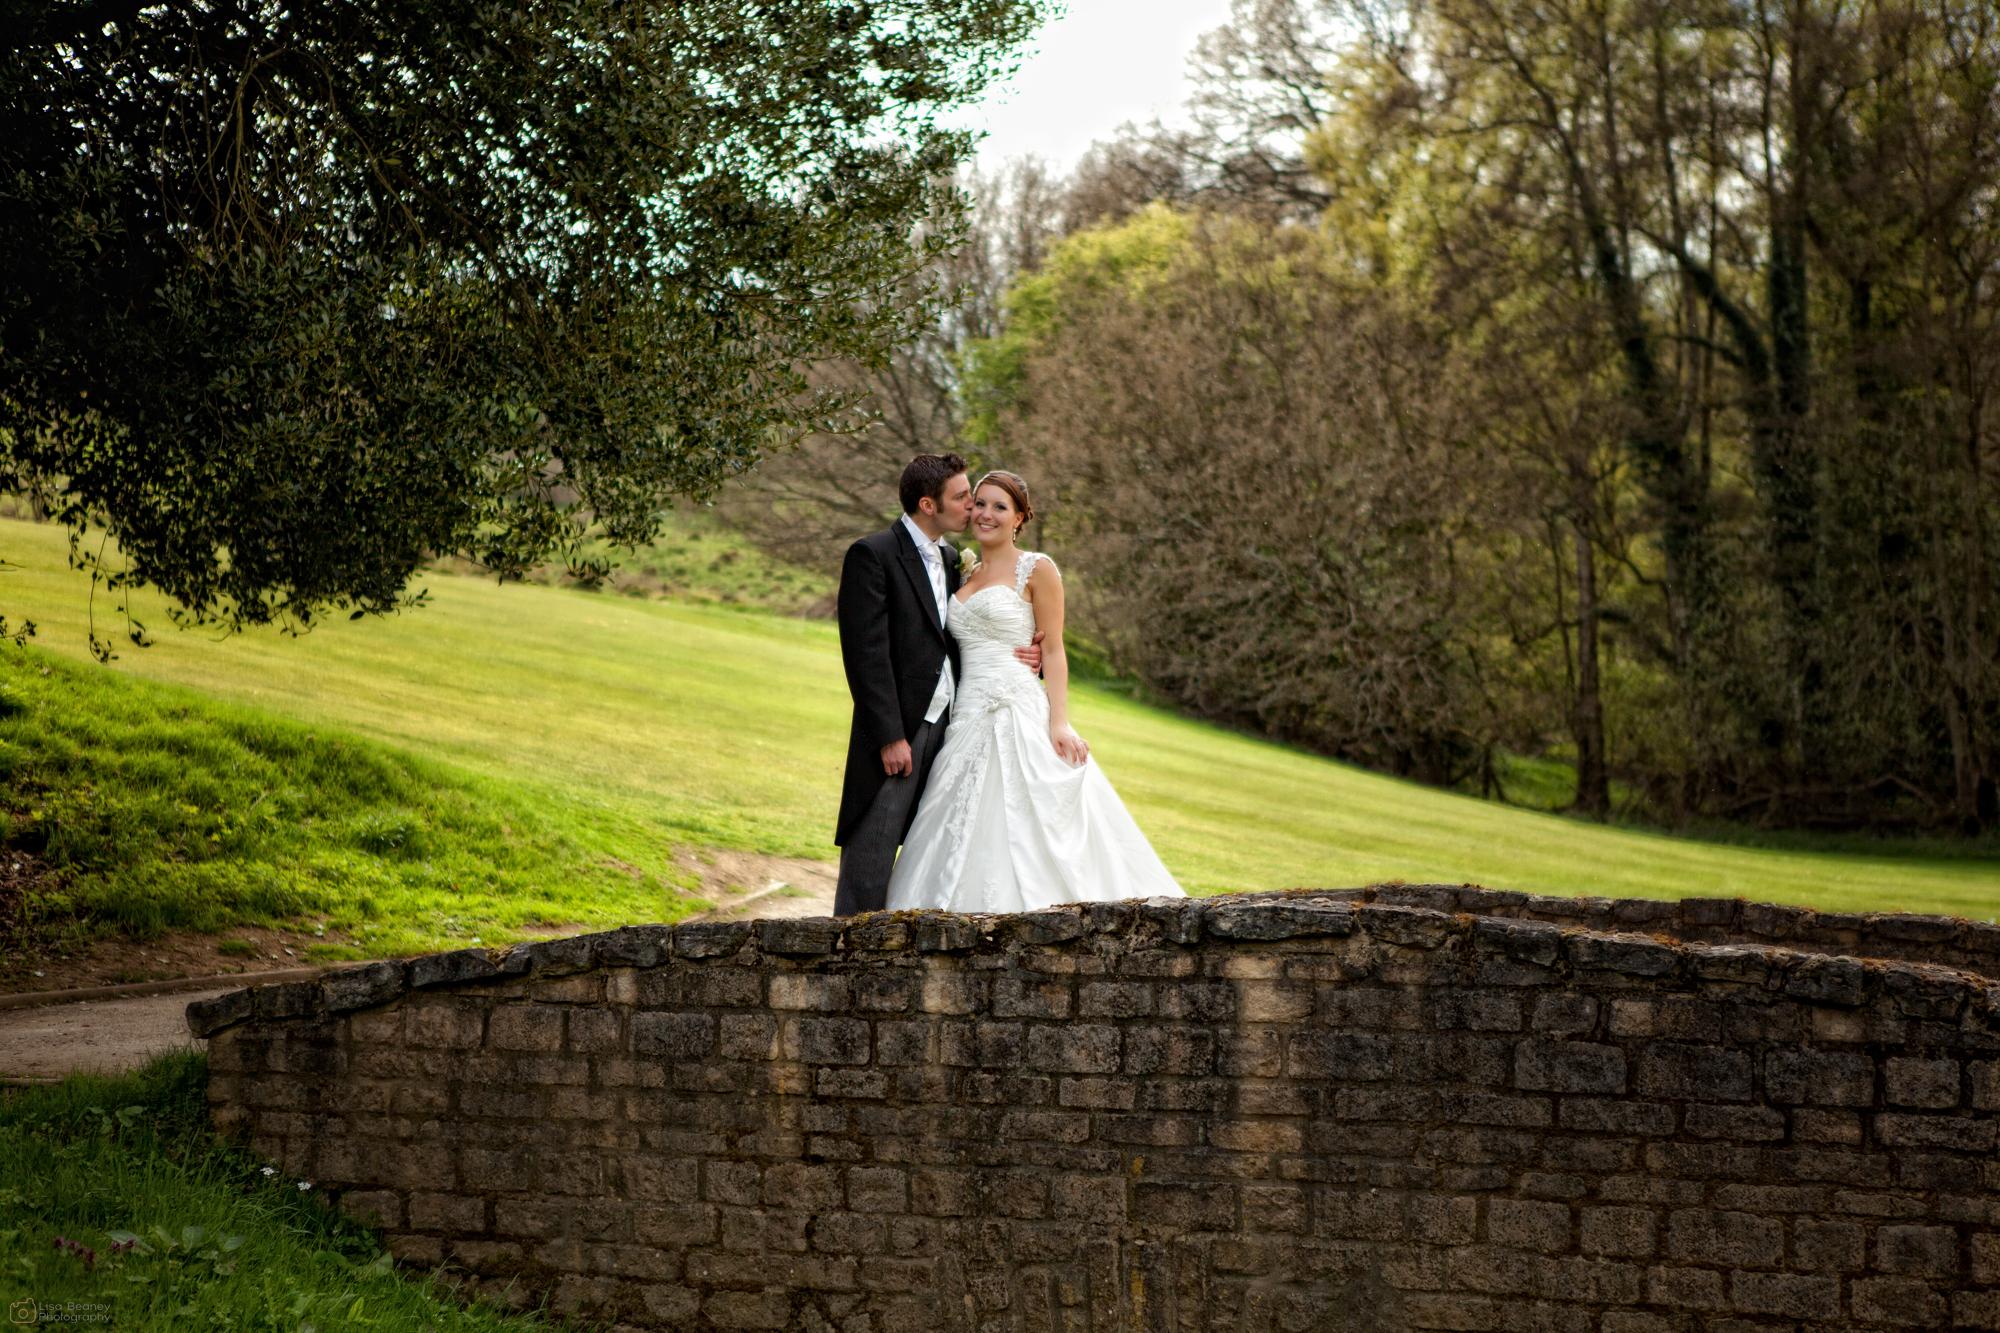 Wedding-photographer-sussex-8.jpg